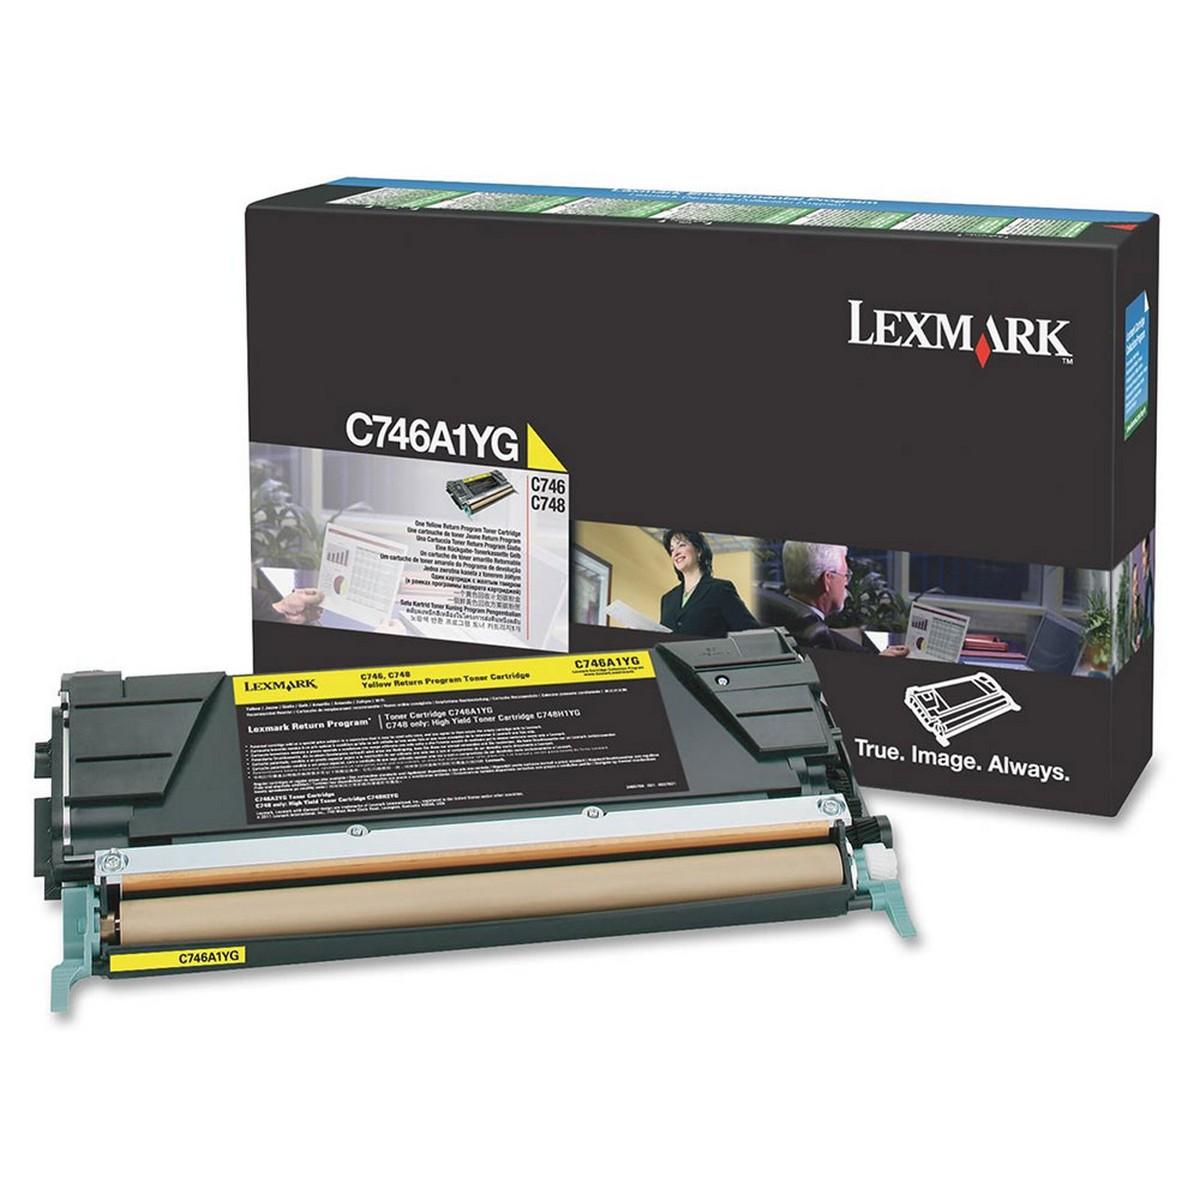 LEXMARK C746A1YG